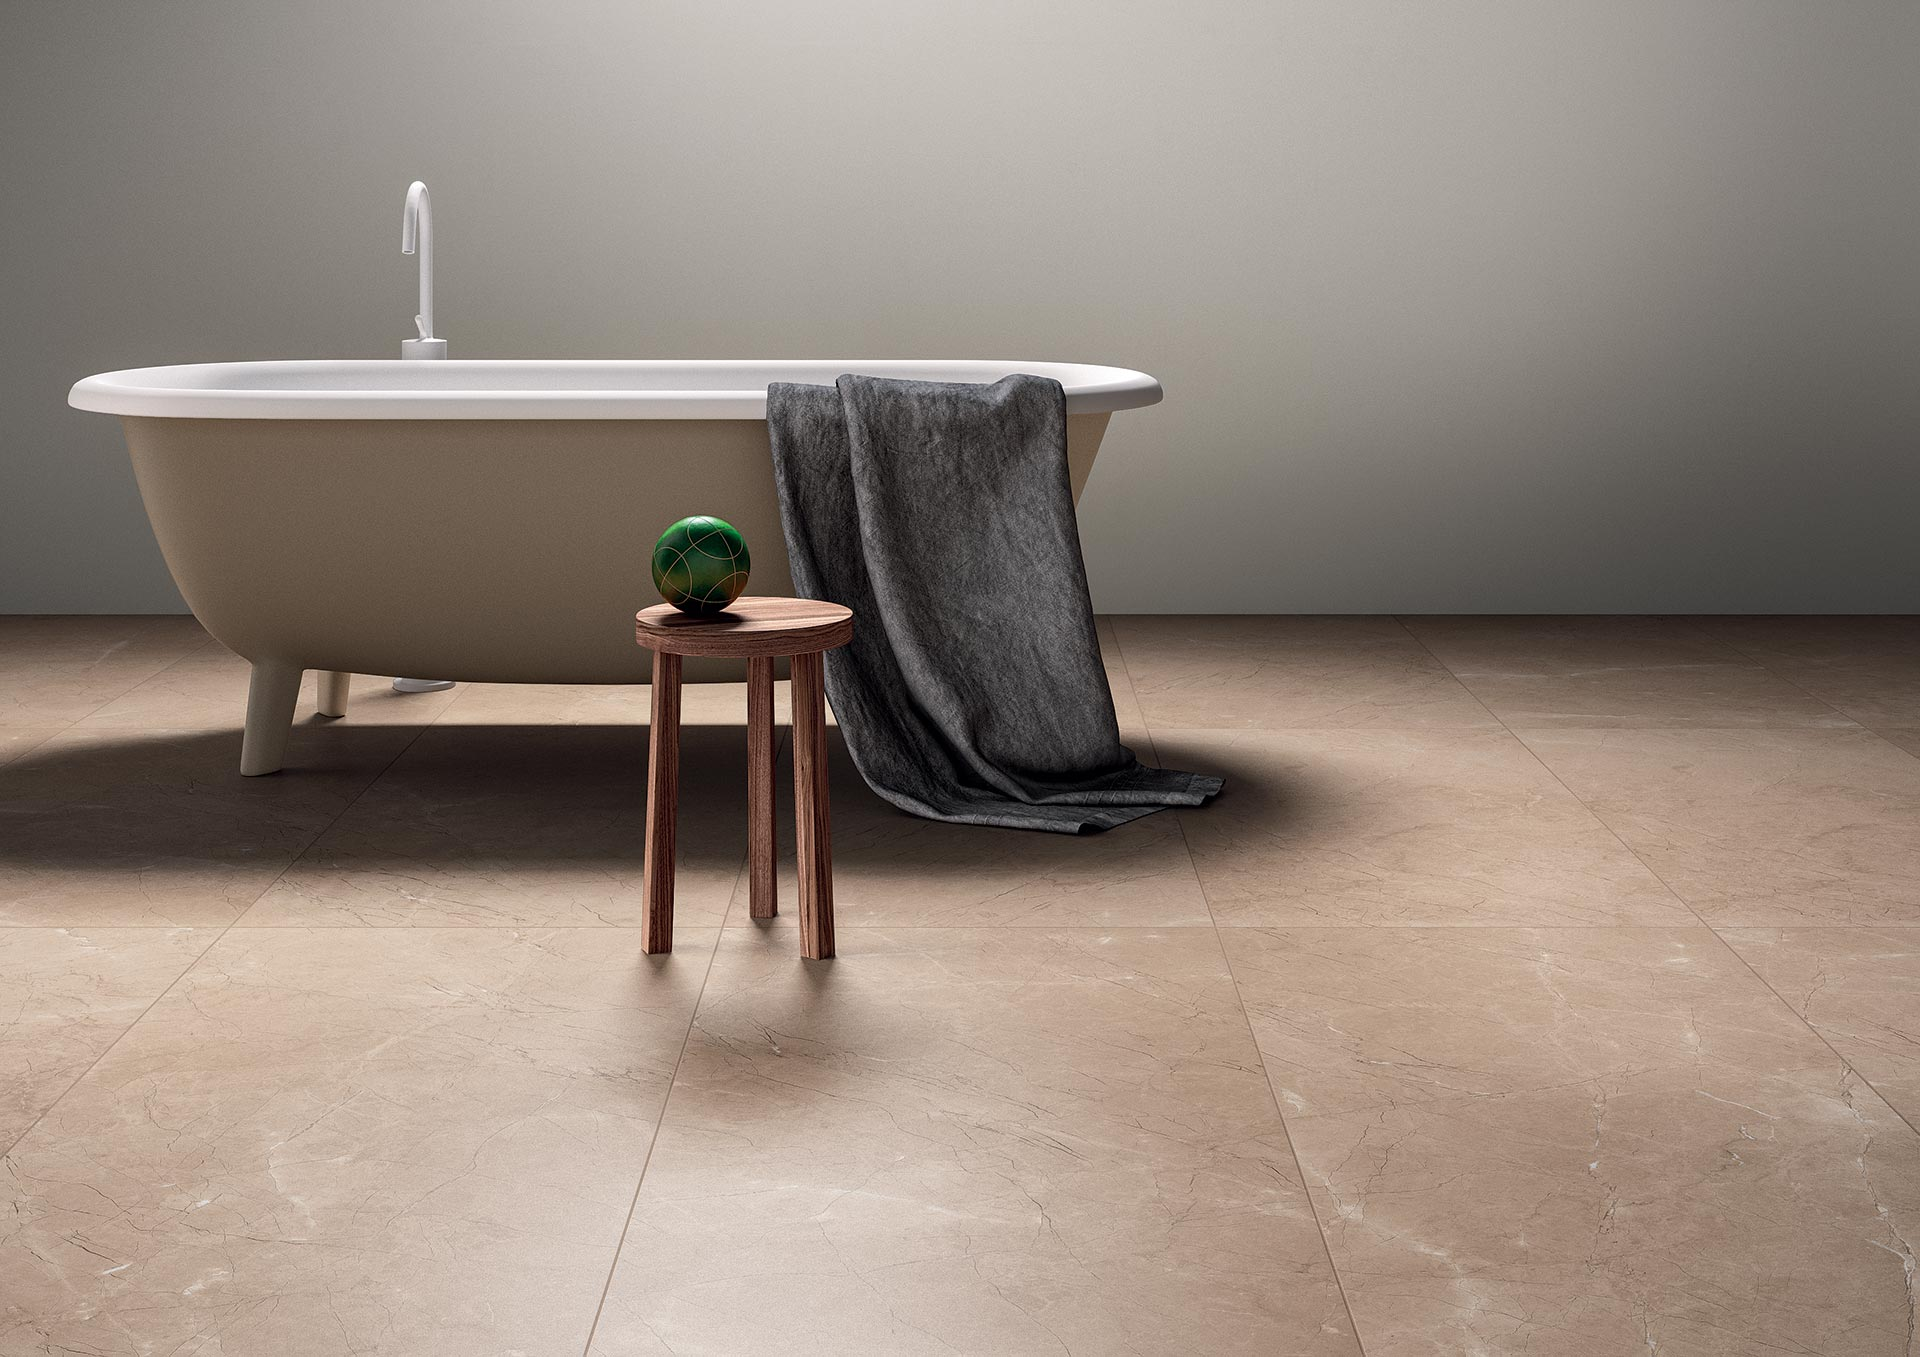 Hydropolis, fabricant de salles de bain haut de gamme